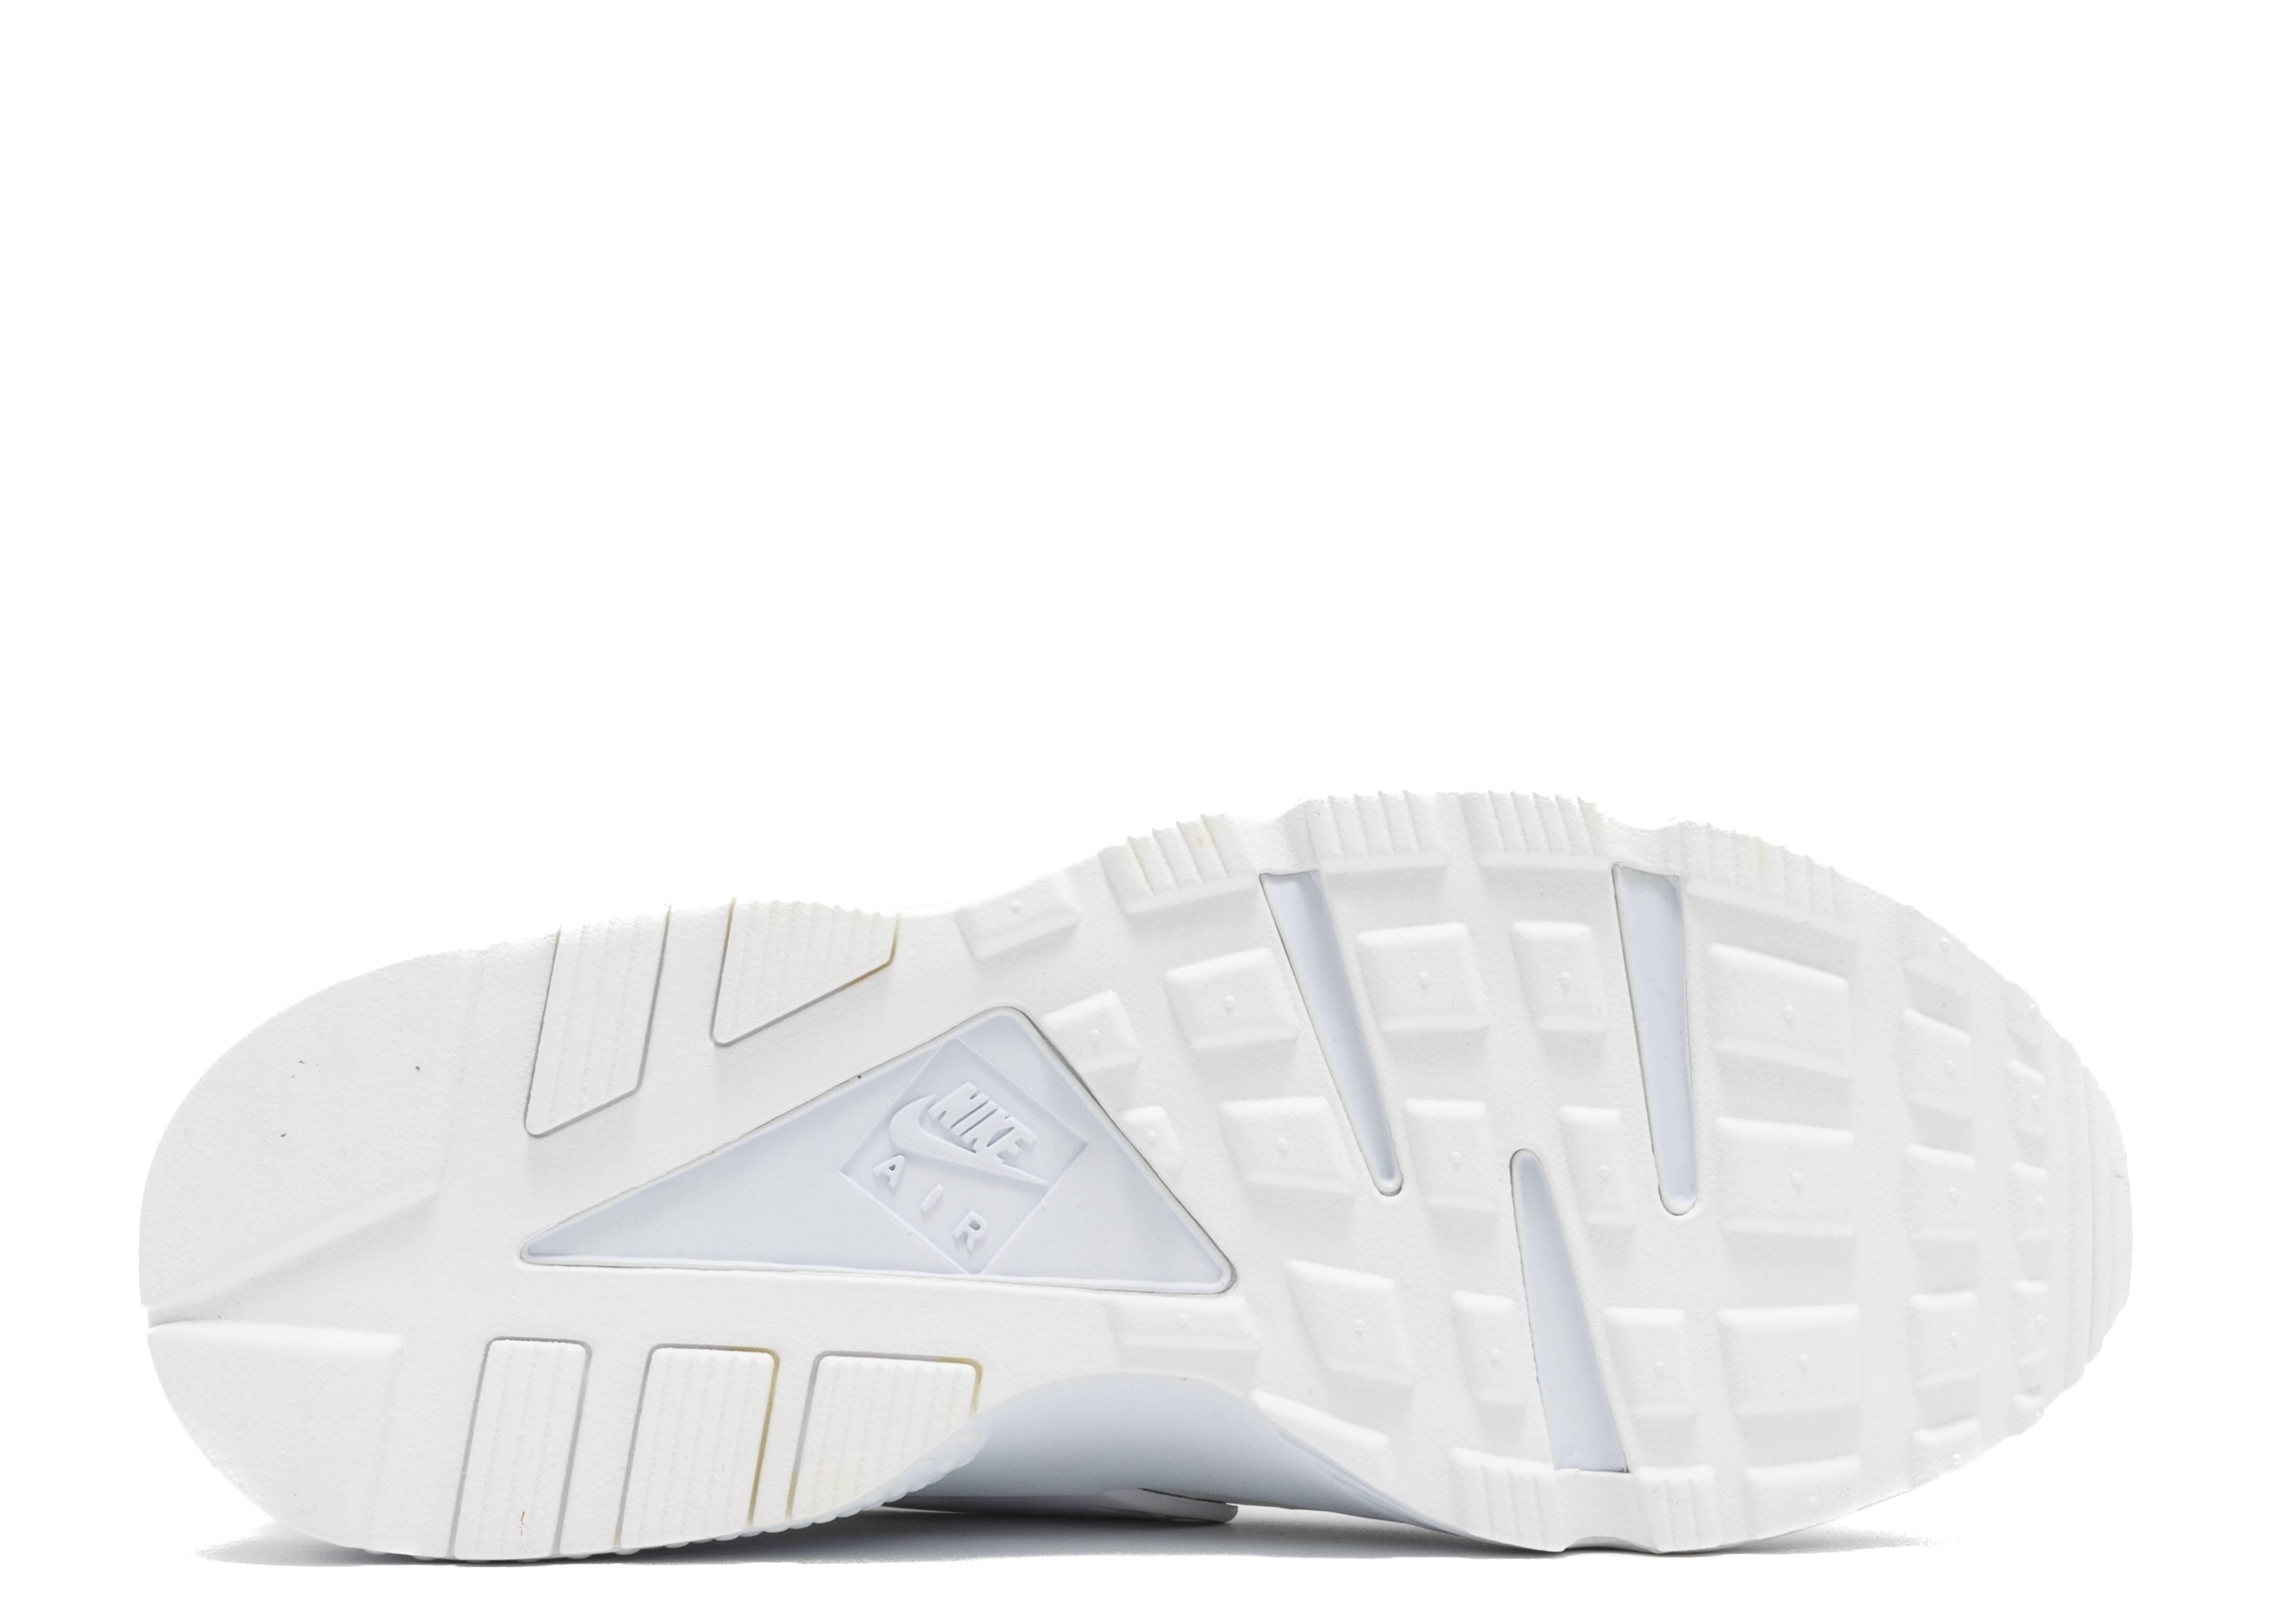 new product ffe99 72be7 Nike Air Huarache Run Prm - Nike - 704830 100 - white white-black   Flight  Club